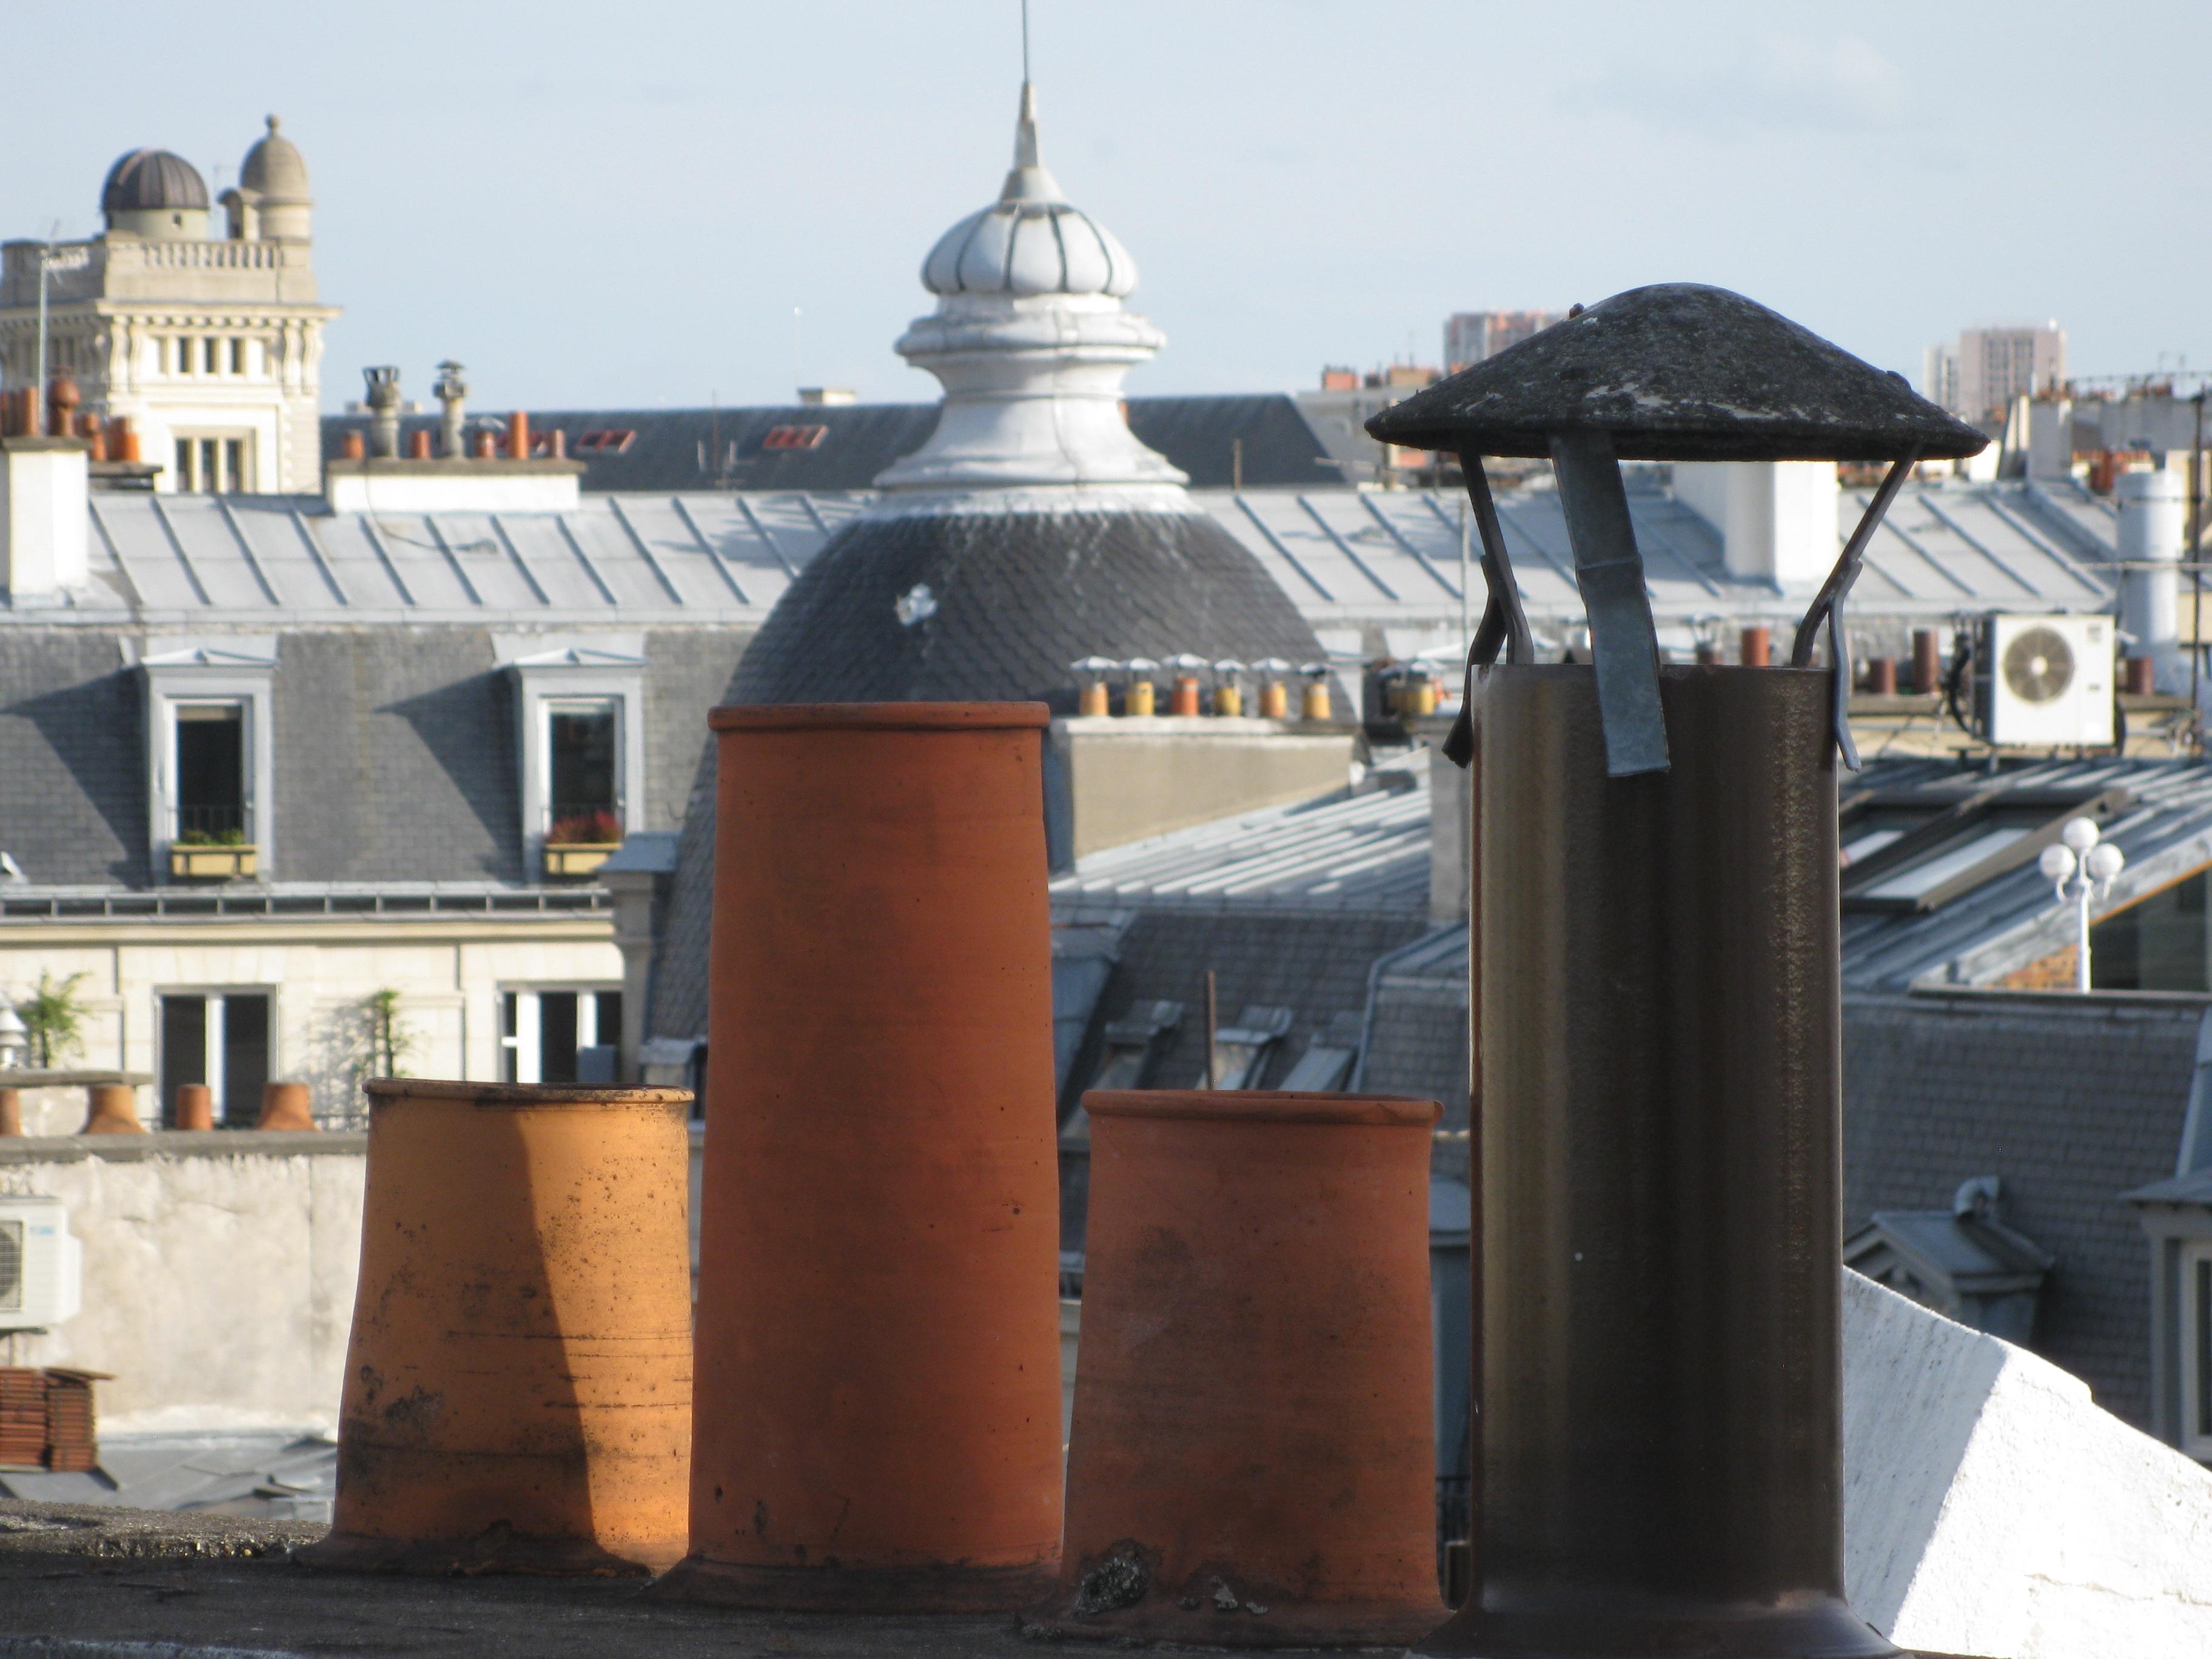 Chimney pots close up